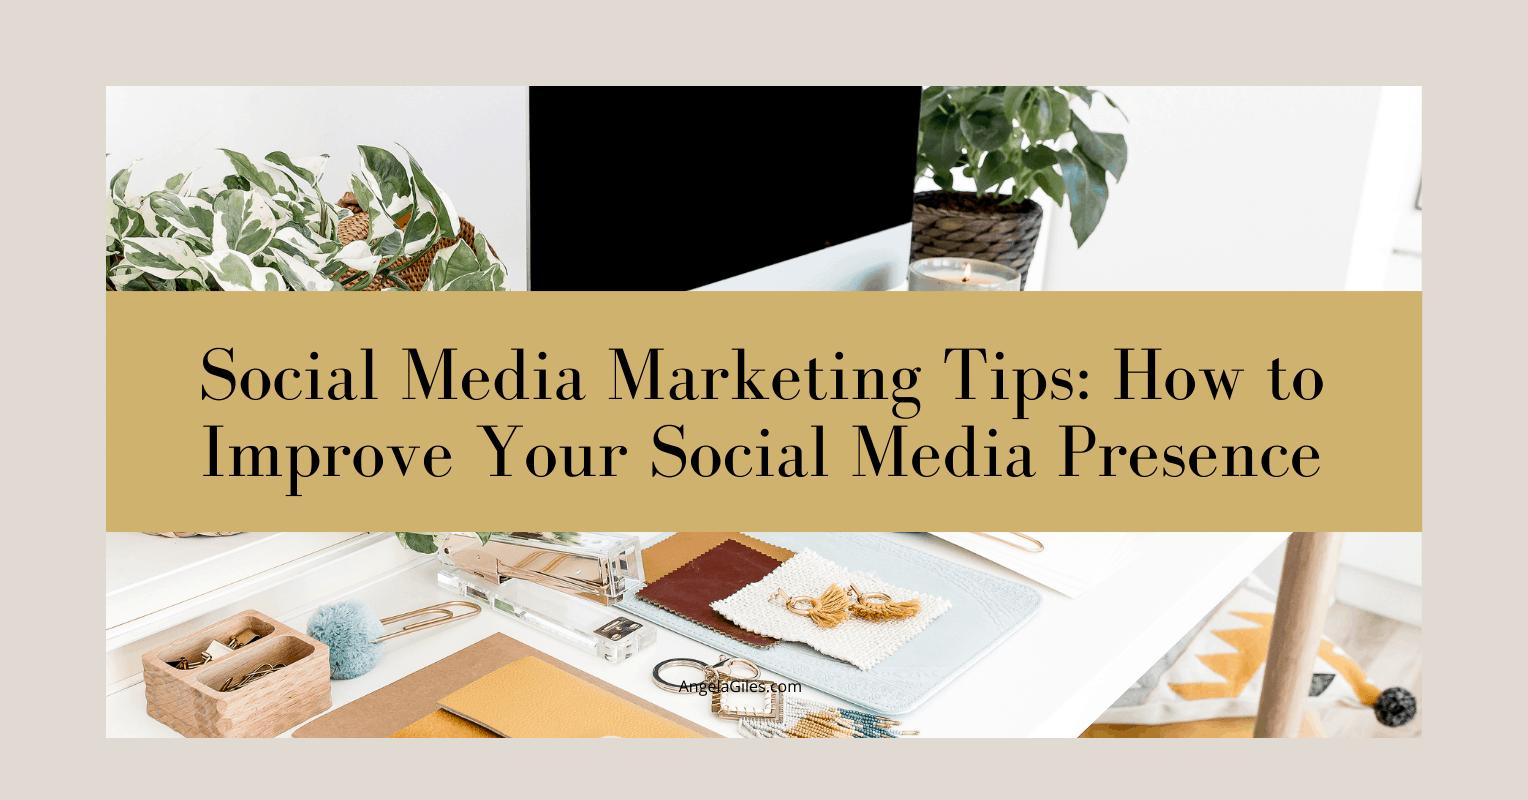 Social Media Marketing Tips: How to Improve Your Social Media Presence